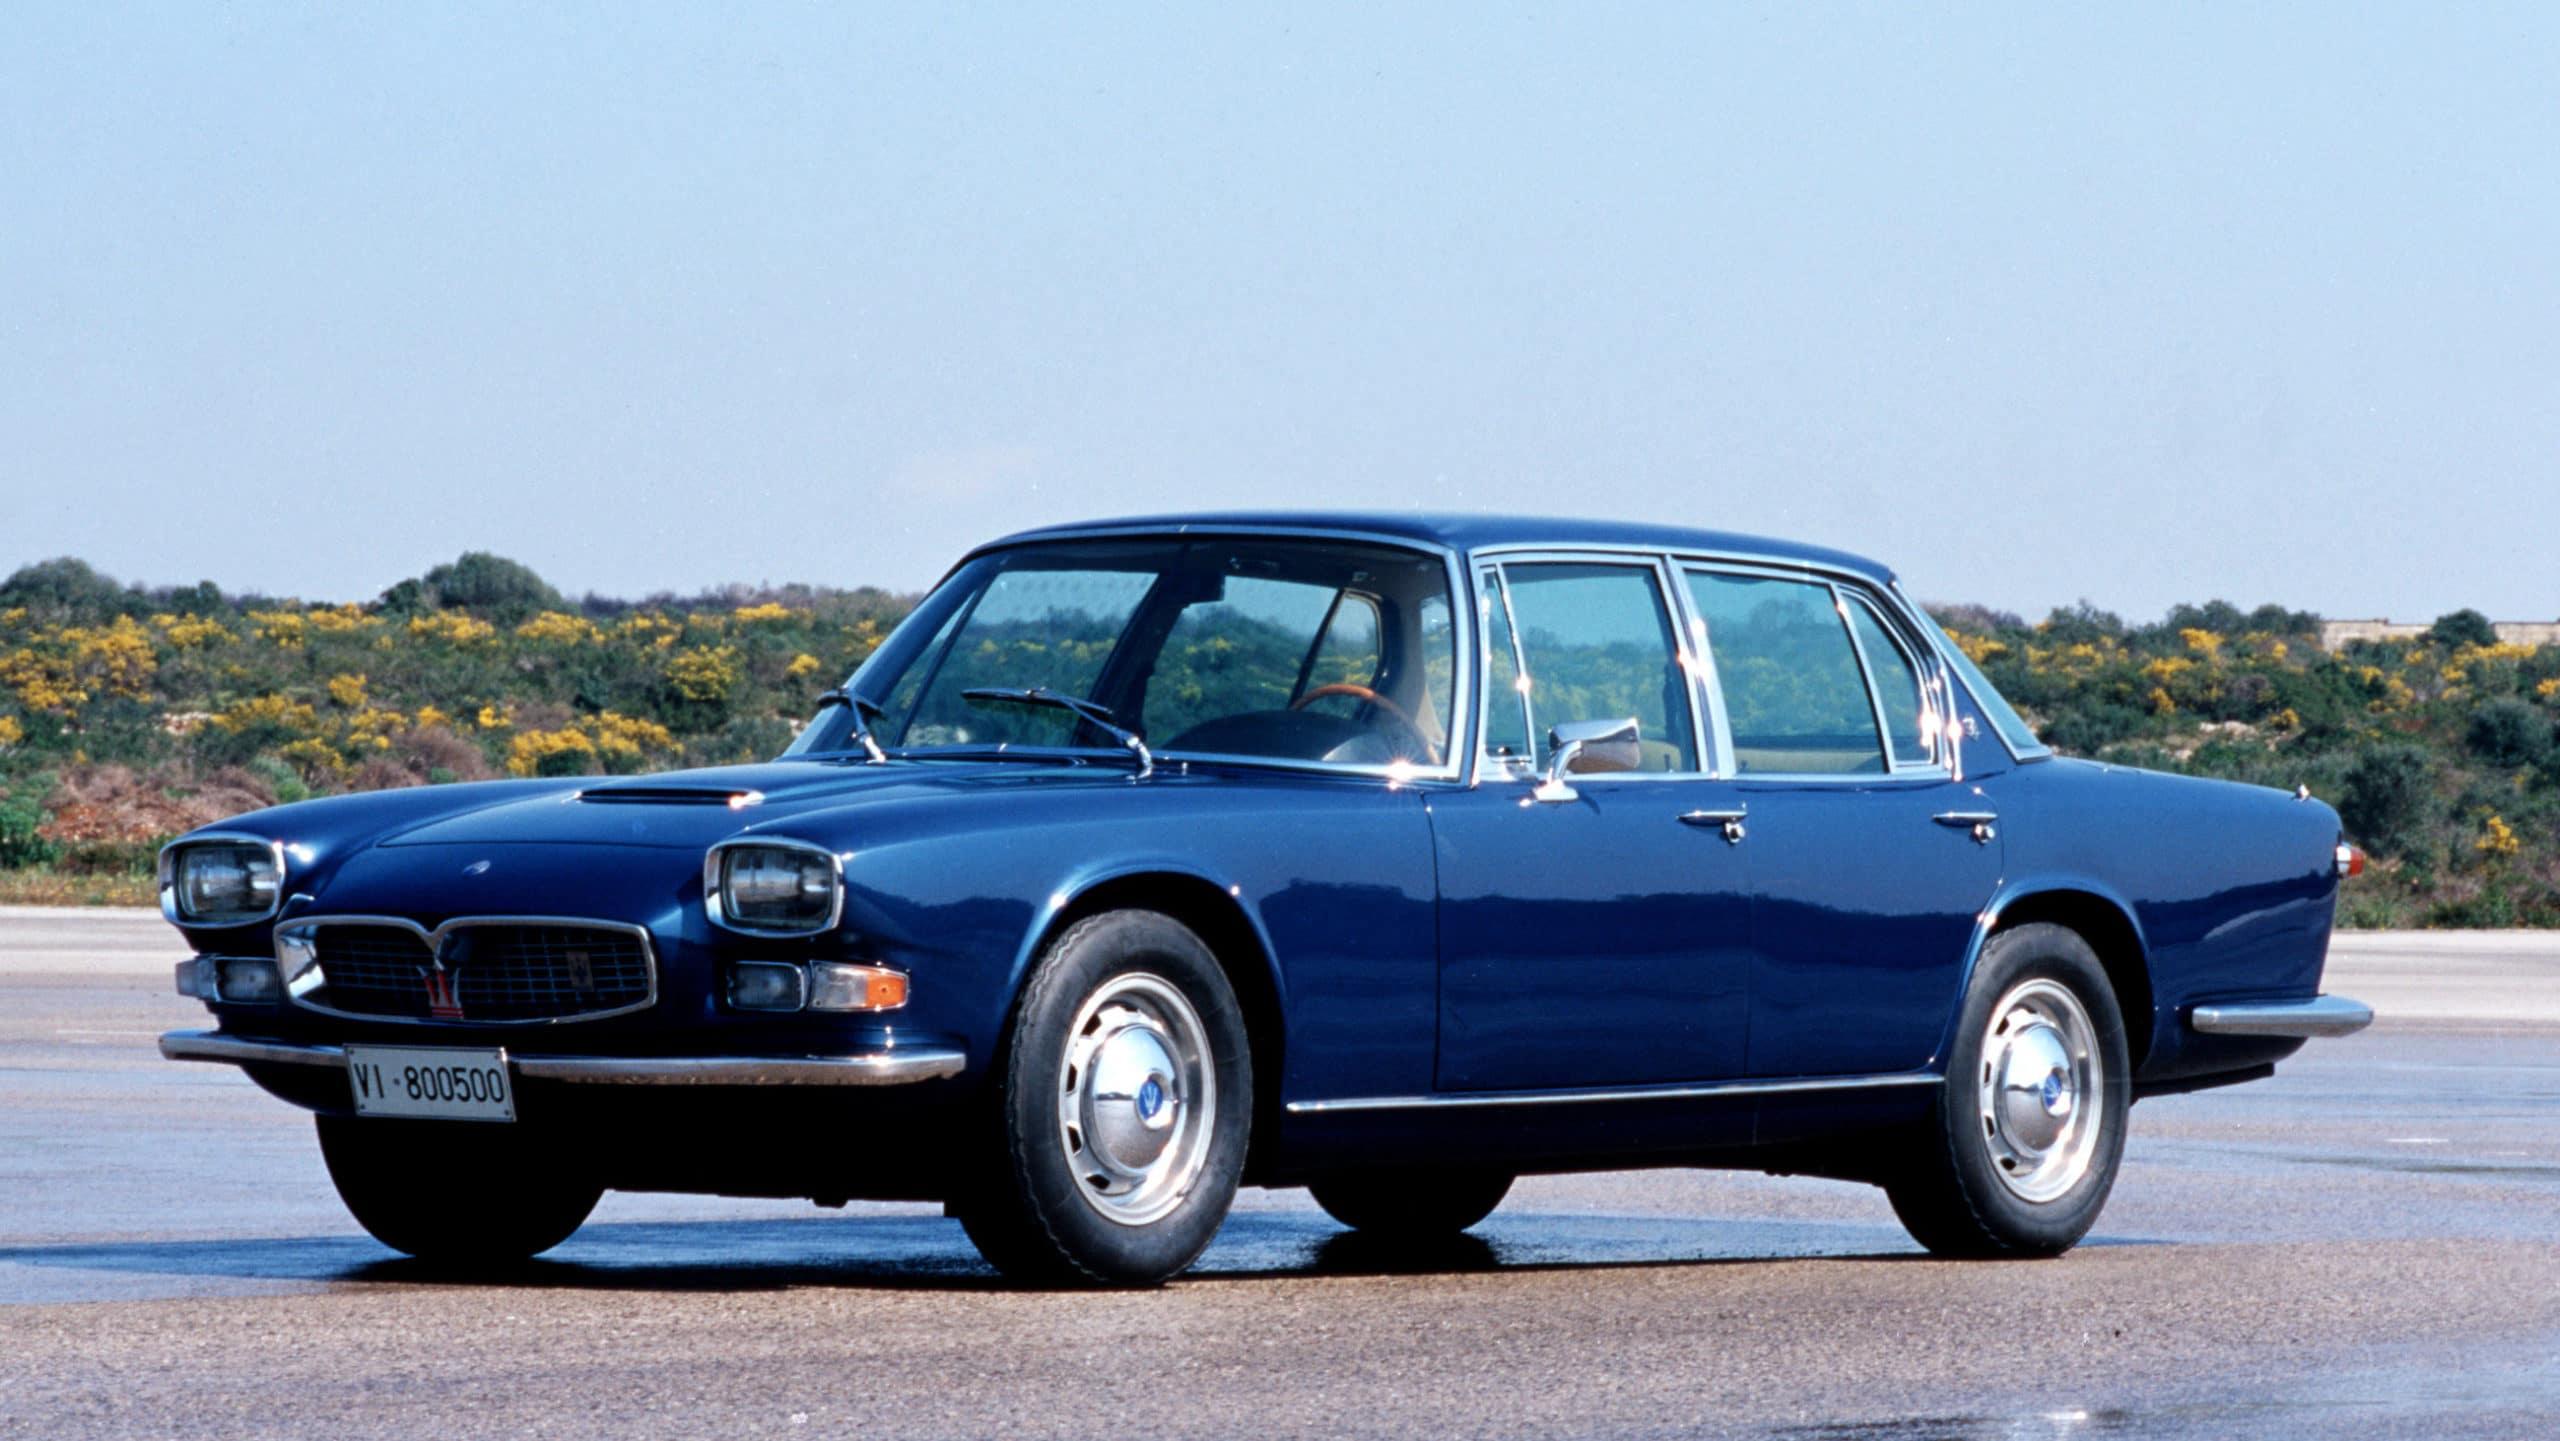 Maserati Quattroporte Gen 1 1 edited scaled